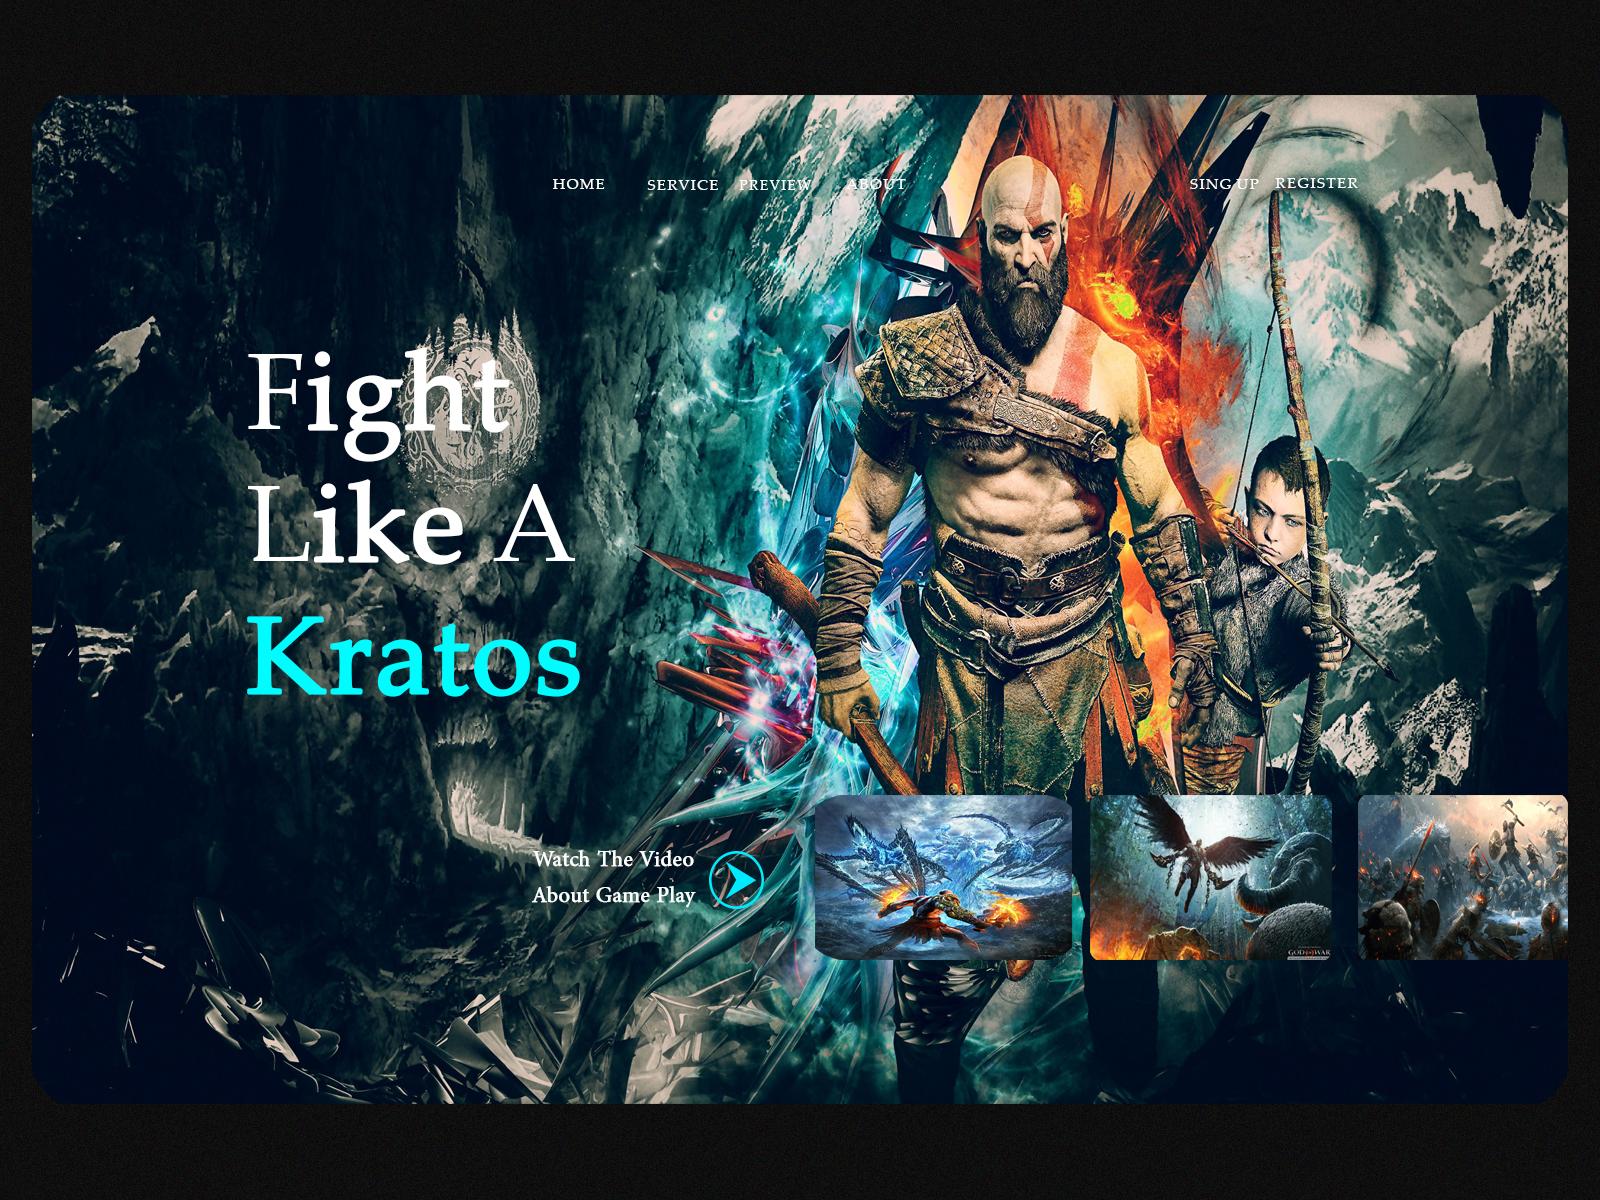 Landing Page God of War cover image